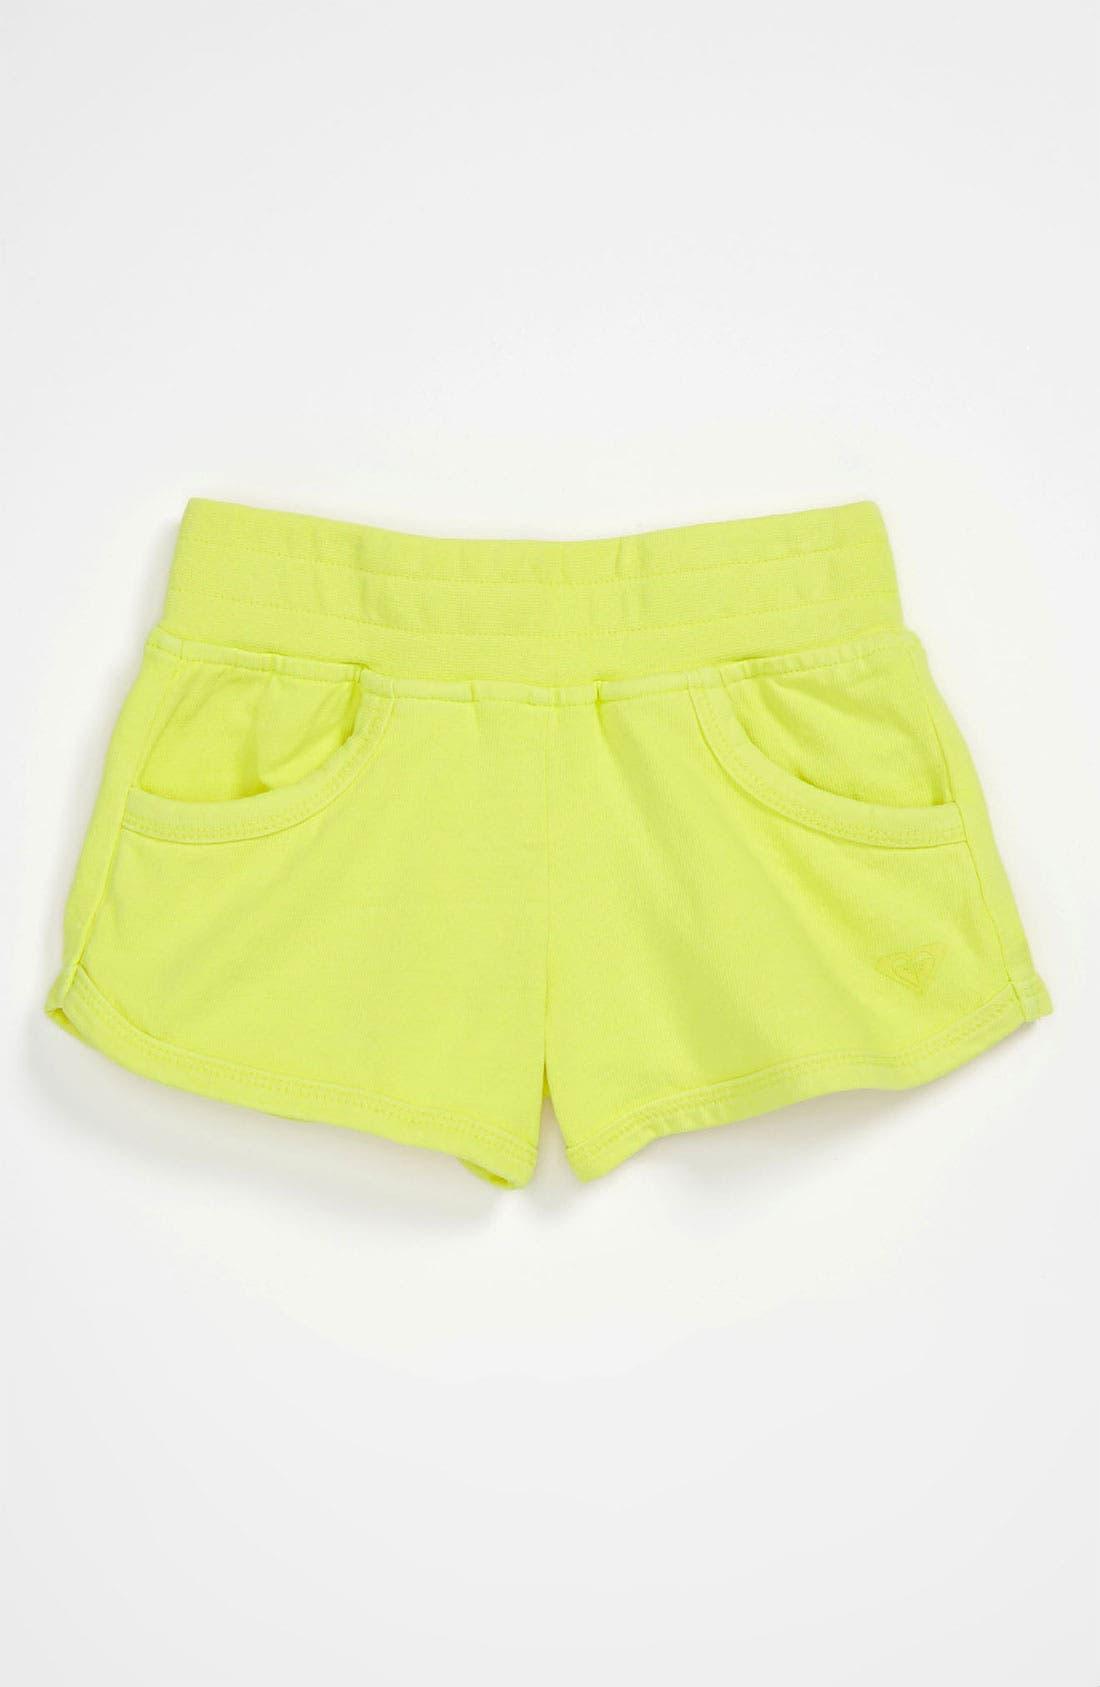 Alternate Image 1 Selected - 'Typhoon' Pull On Shorts (Little Girls)